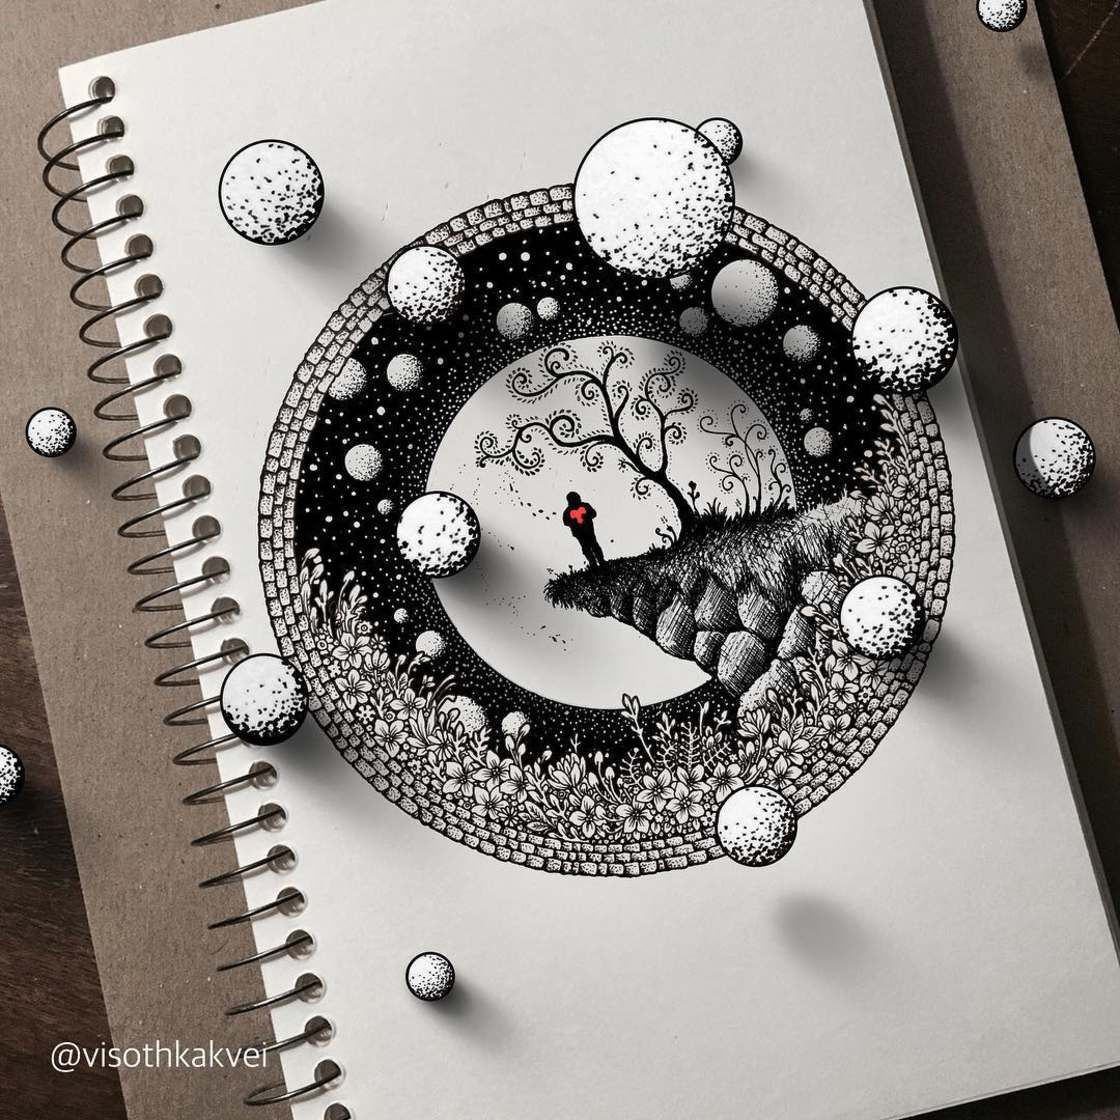 Les Superbes Doodles Augmentes De Visothkakvei Doodles Zentangles